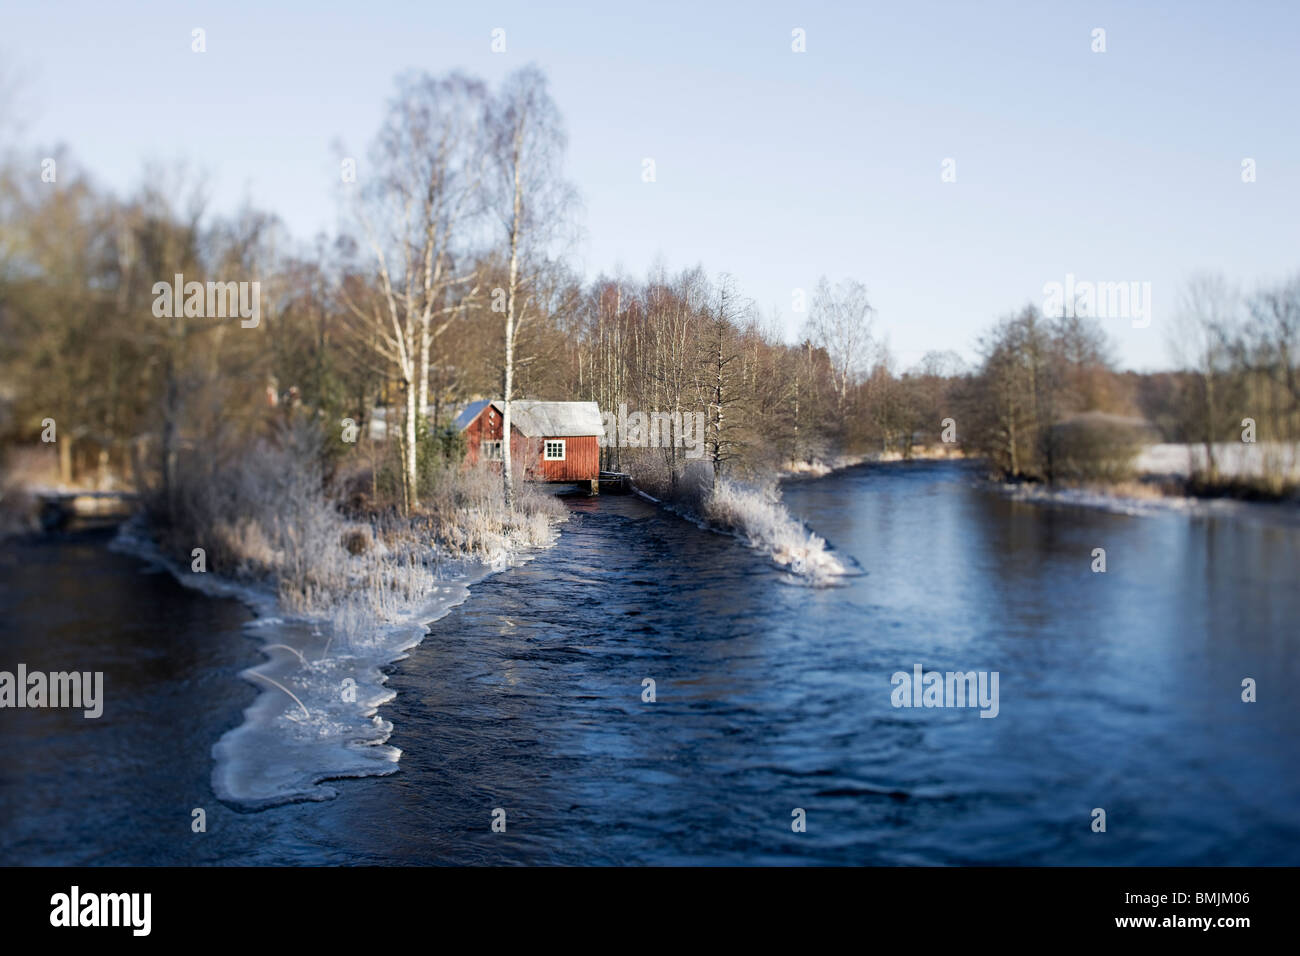 Skandinavien, Schweden, Skane, Blick auf Weiherhaus Stockbild